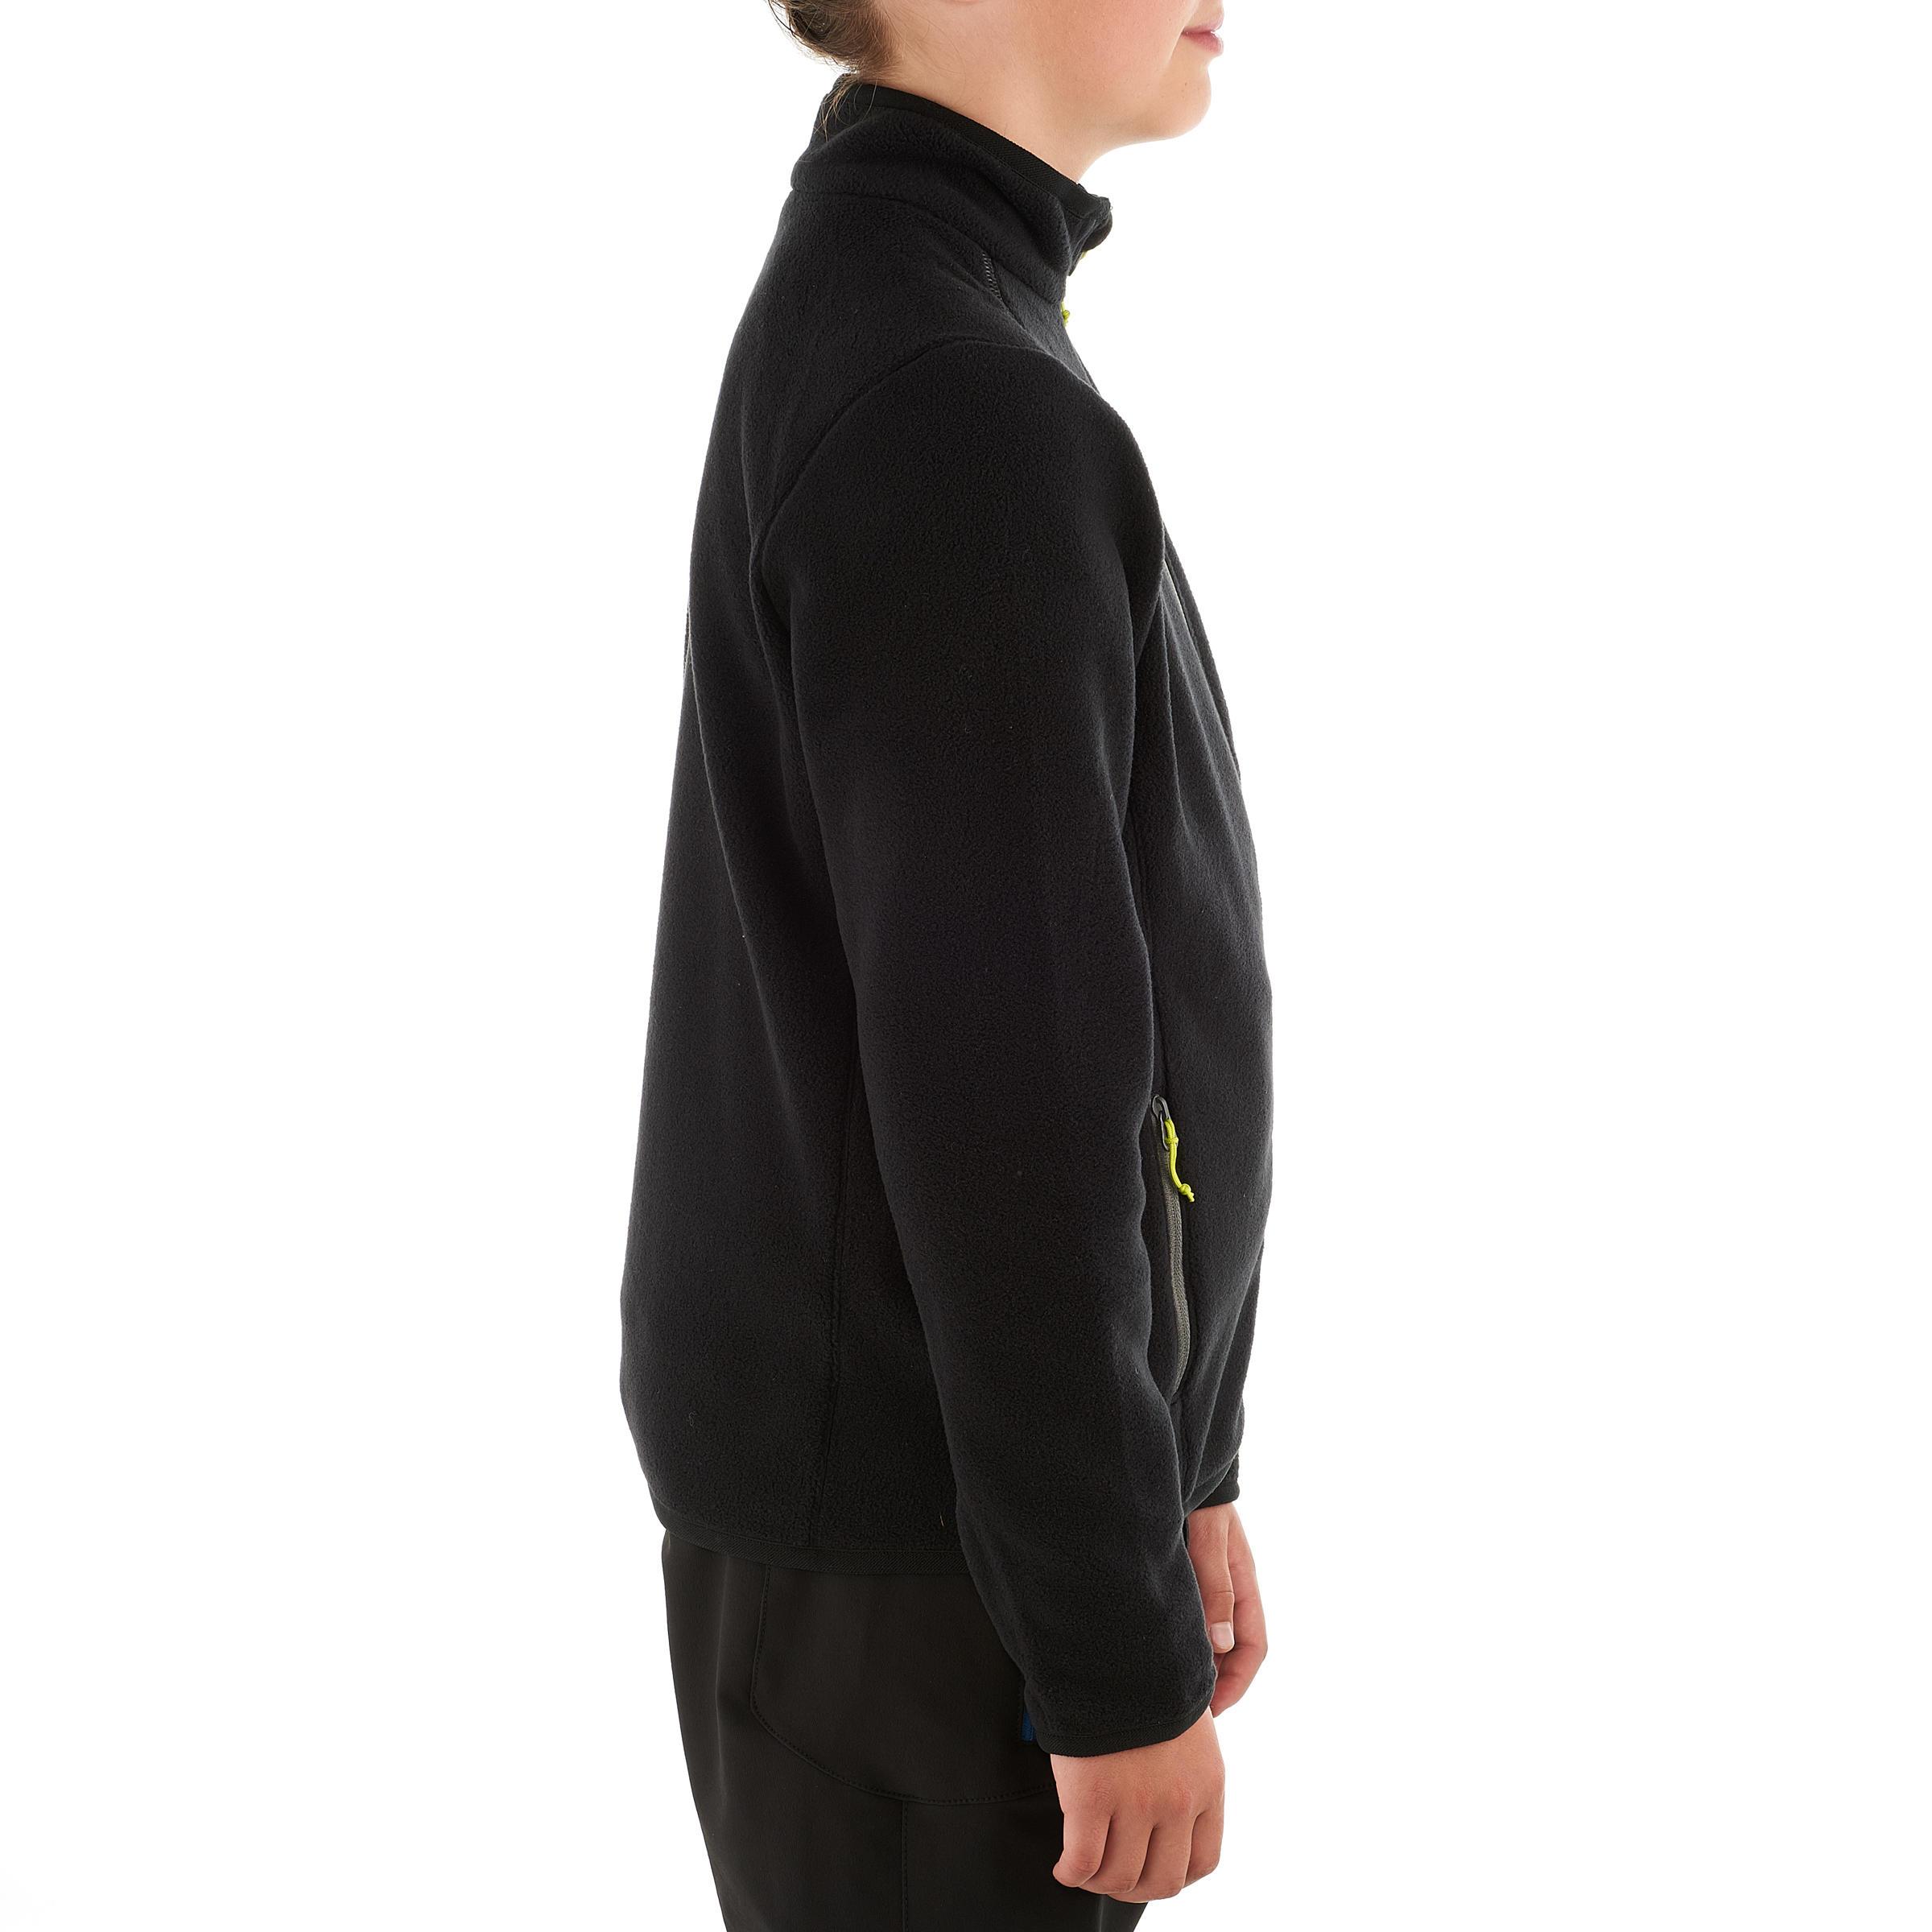 Boy's Hiking Fleece Jacket Hike 150 - Black